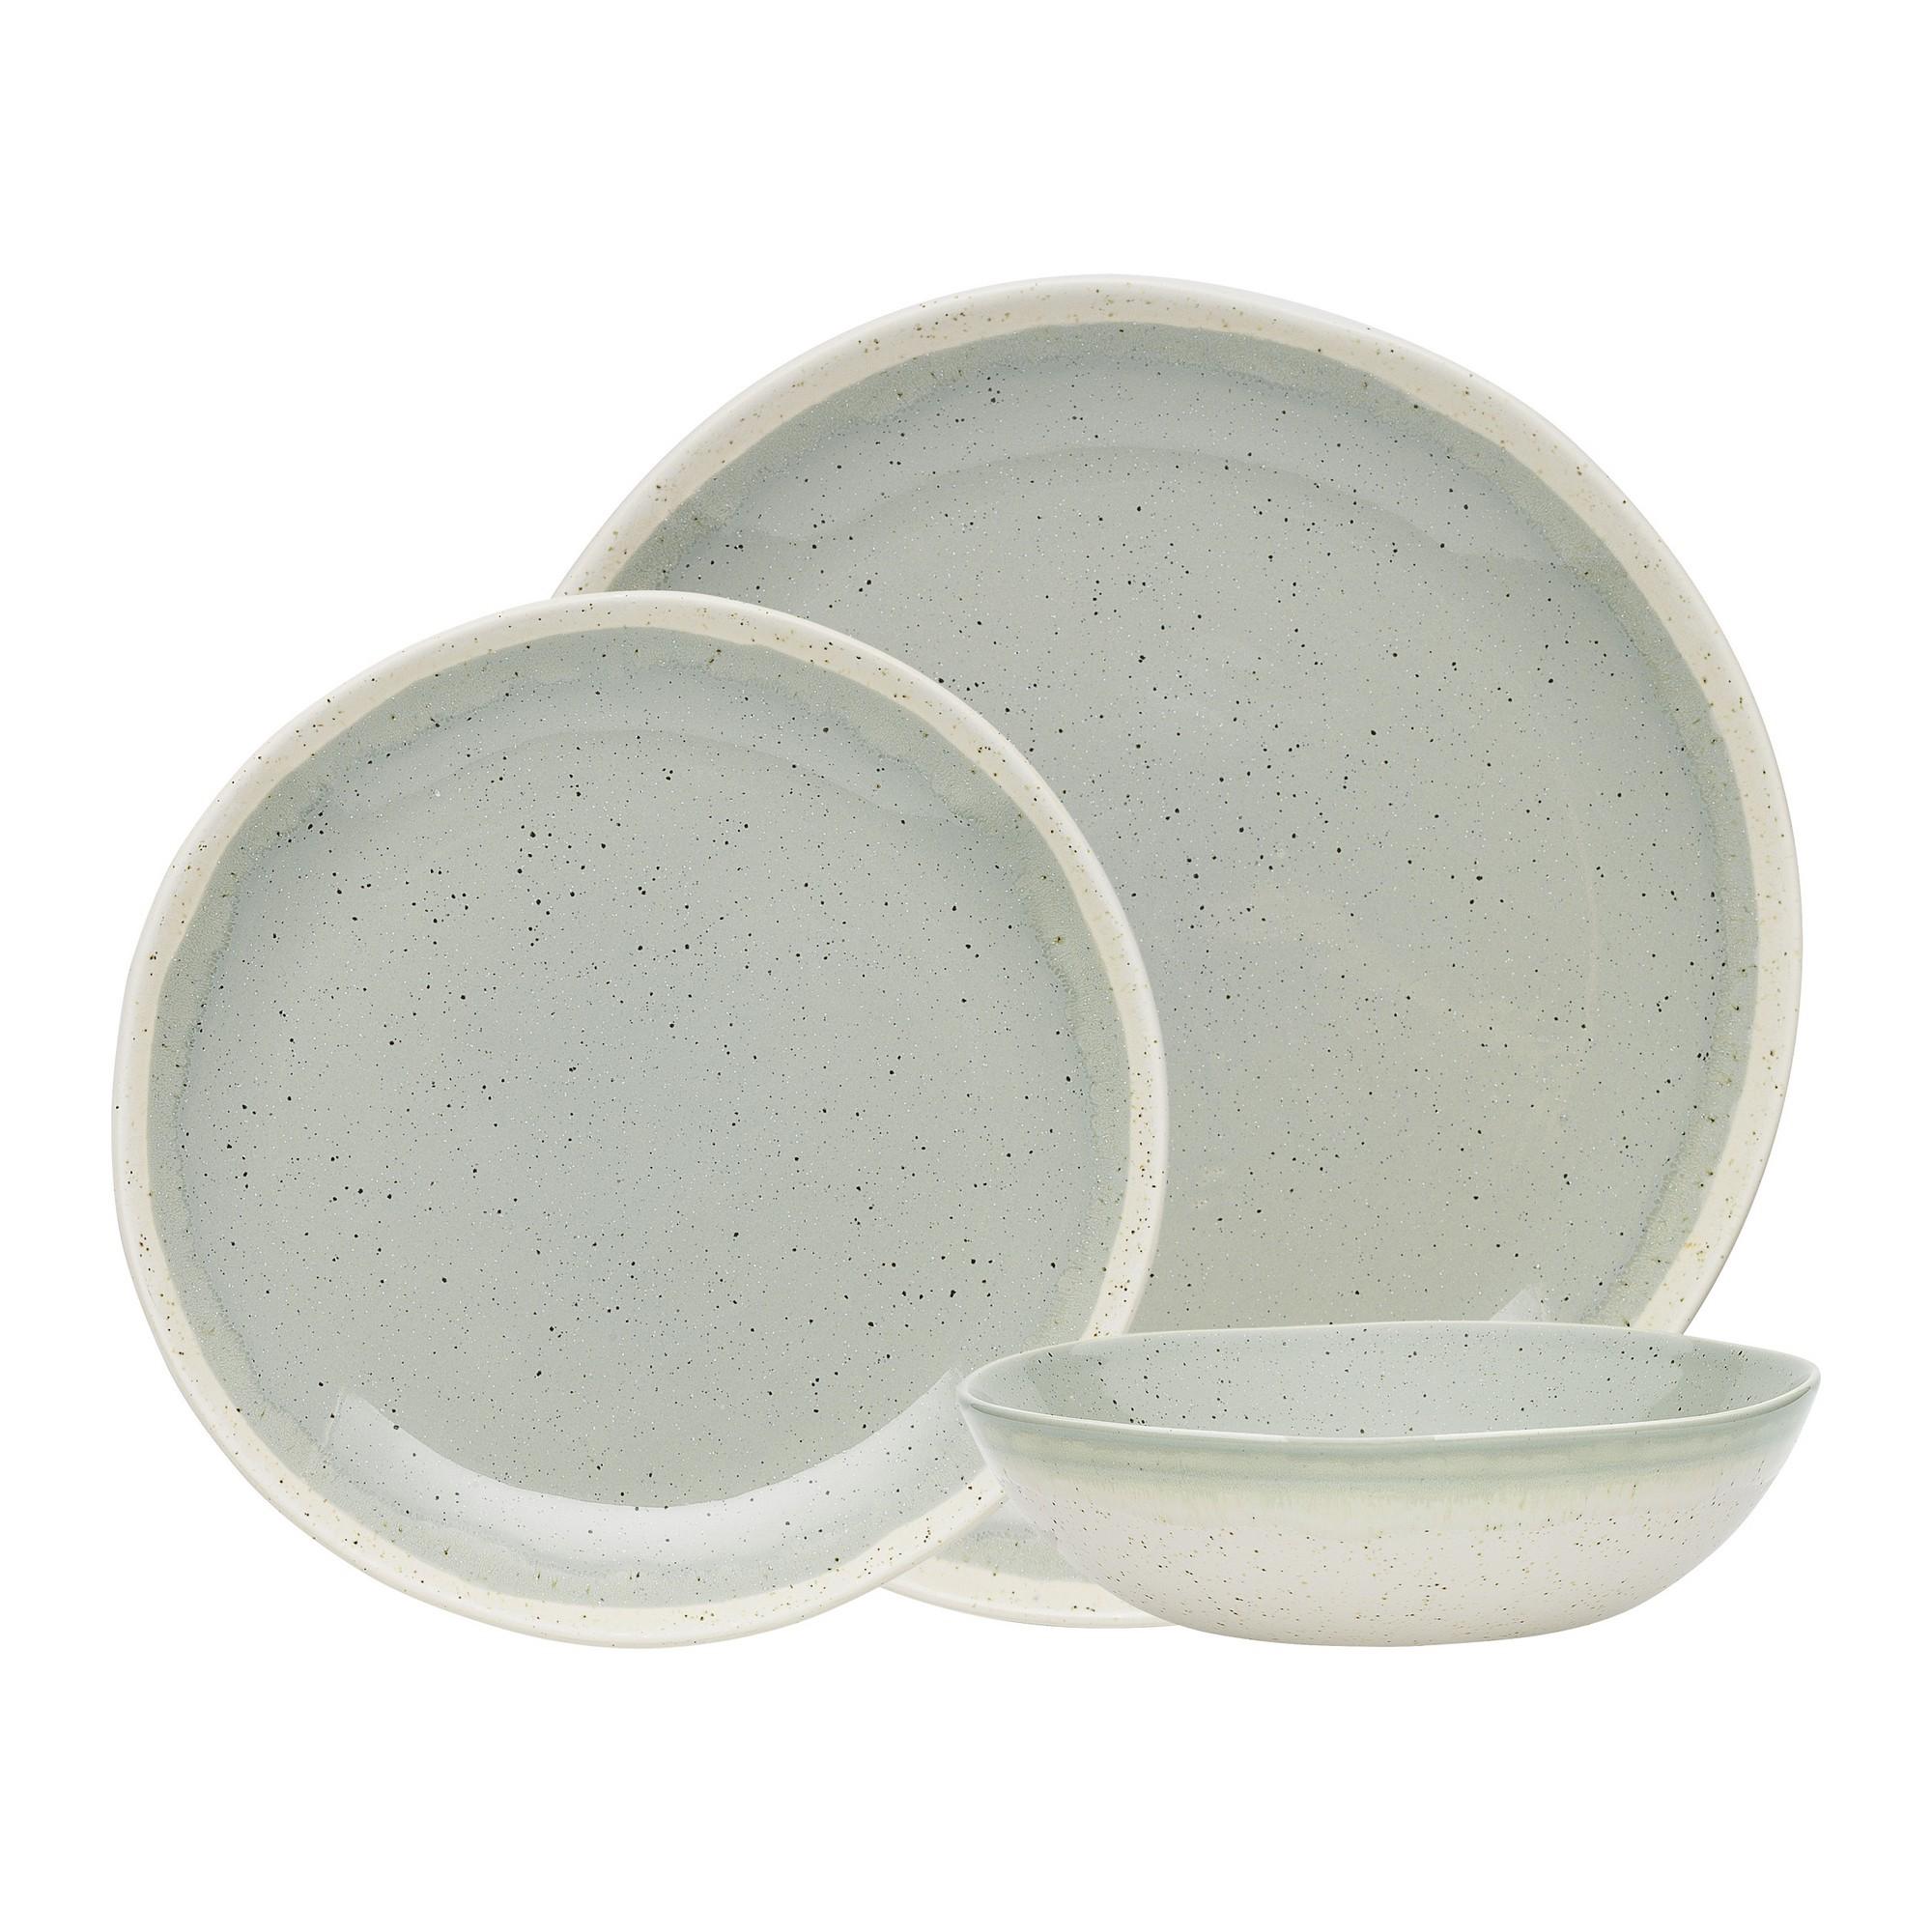 Ecology Dawn 12 Piece Stoneware Dinner Set, Matcha